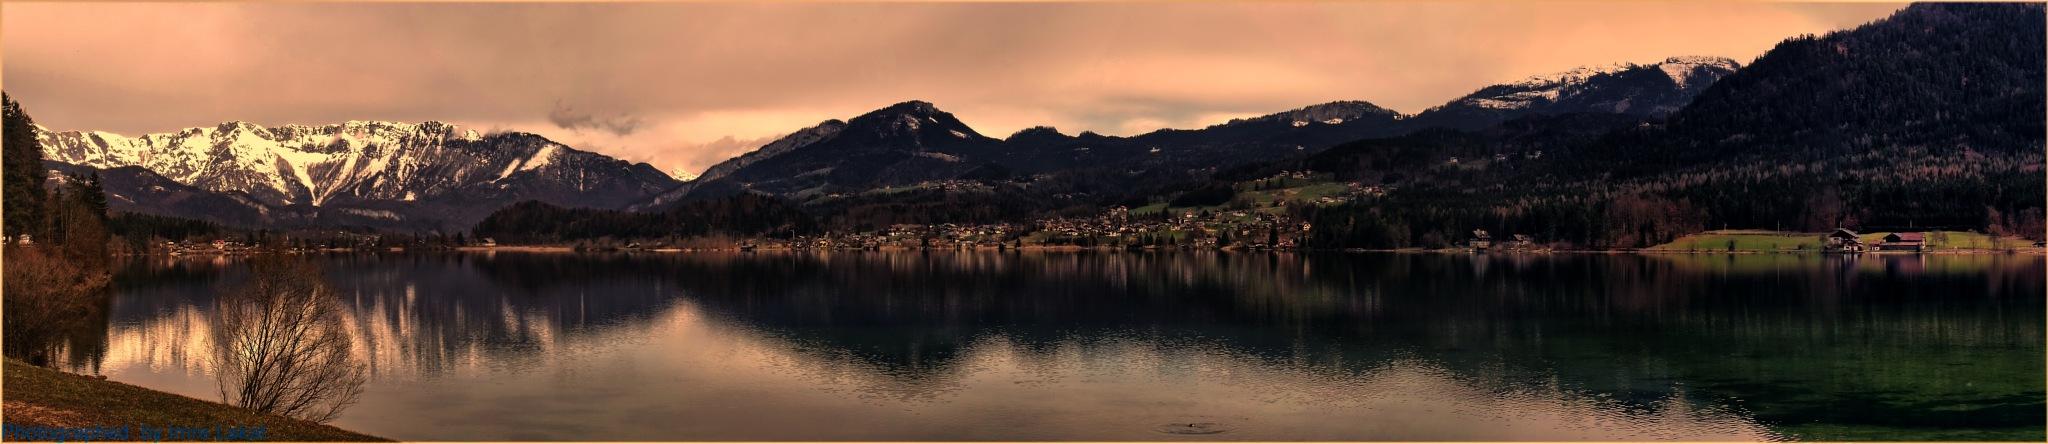 Hallstatt Gosaumühle, Hallstatt, Austria  by Imre Lakat